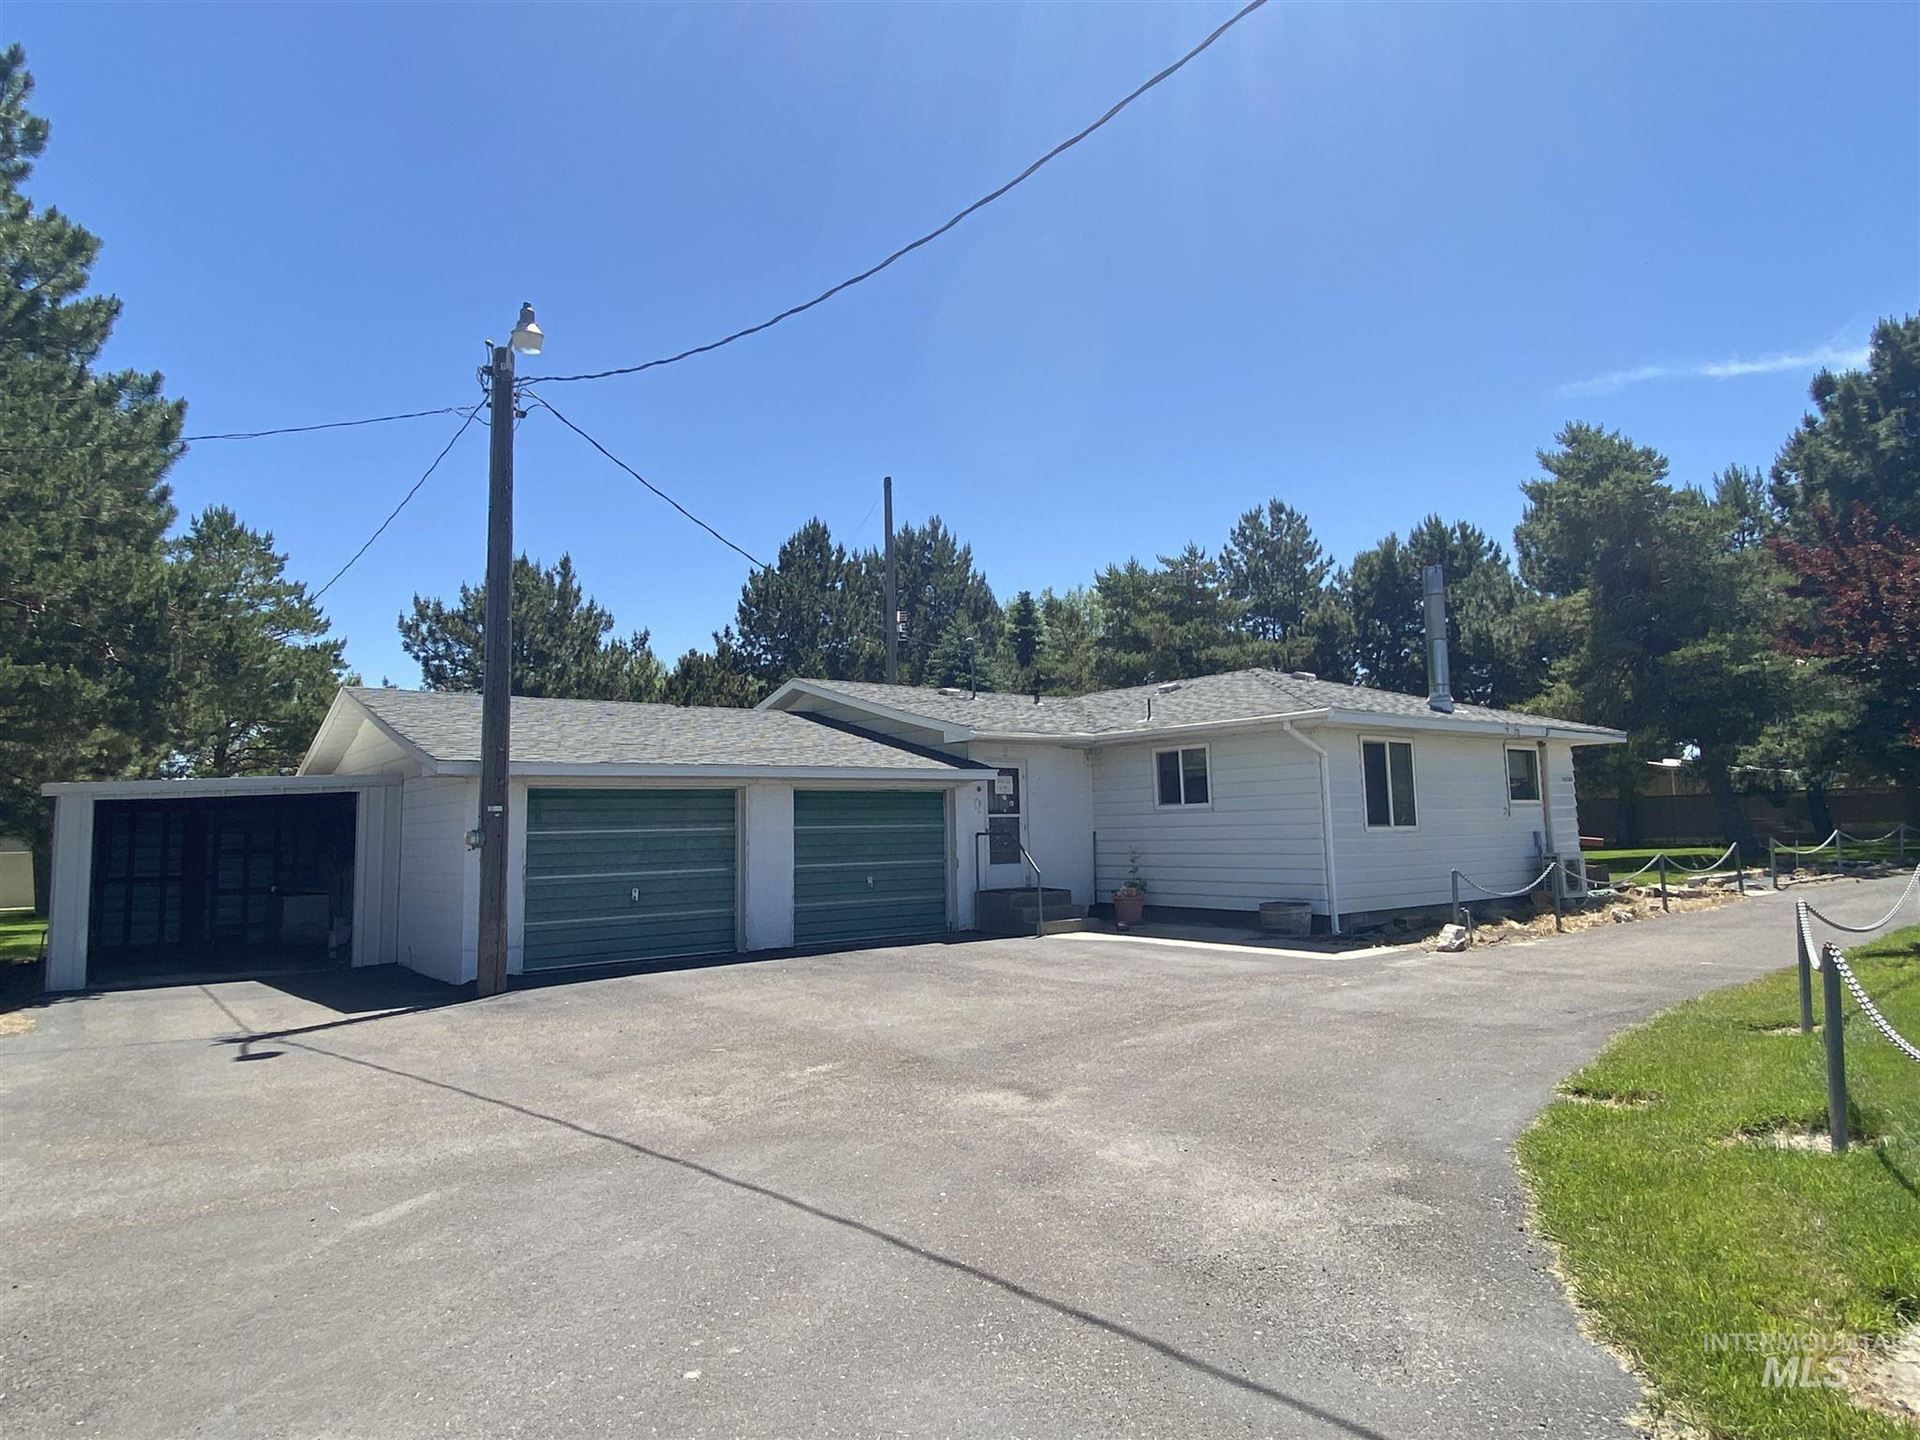 Photo of 288 S 500 W, Heyburn, ID 83336 (MLS # 98807043)